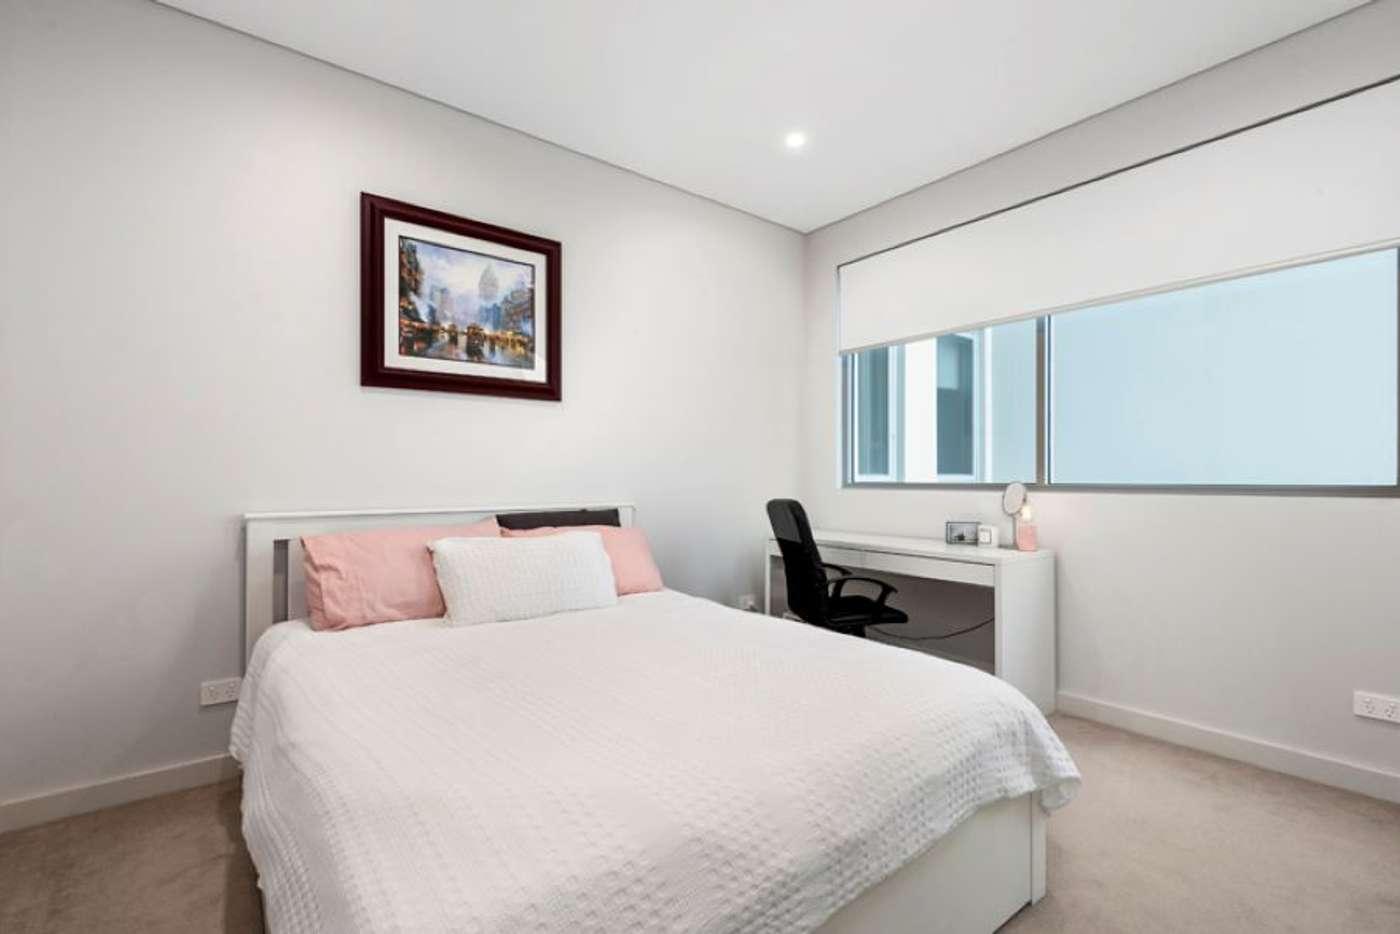 Sixth view of Homely apartment listing, 704/3 Pretoria Parade, Hornsby NSW 2077